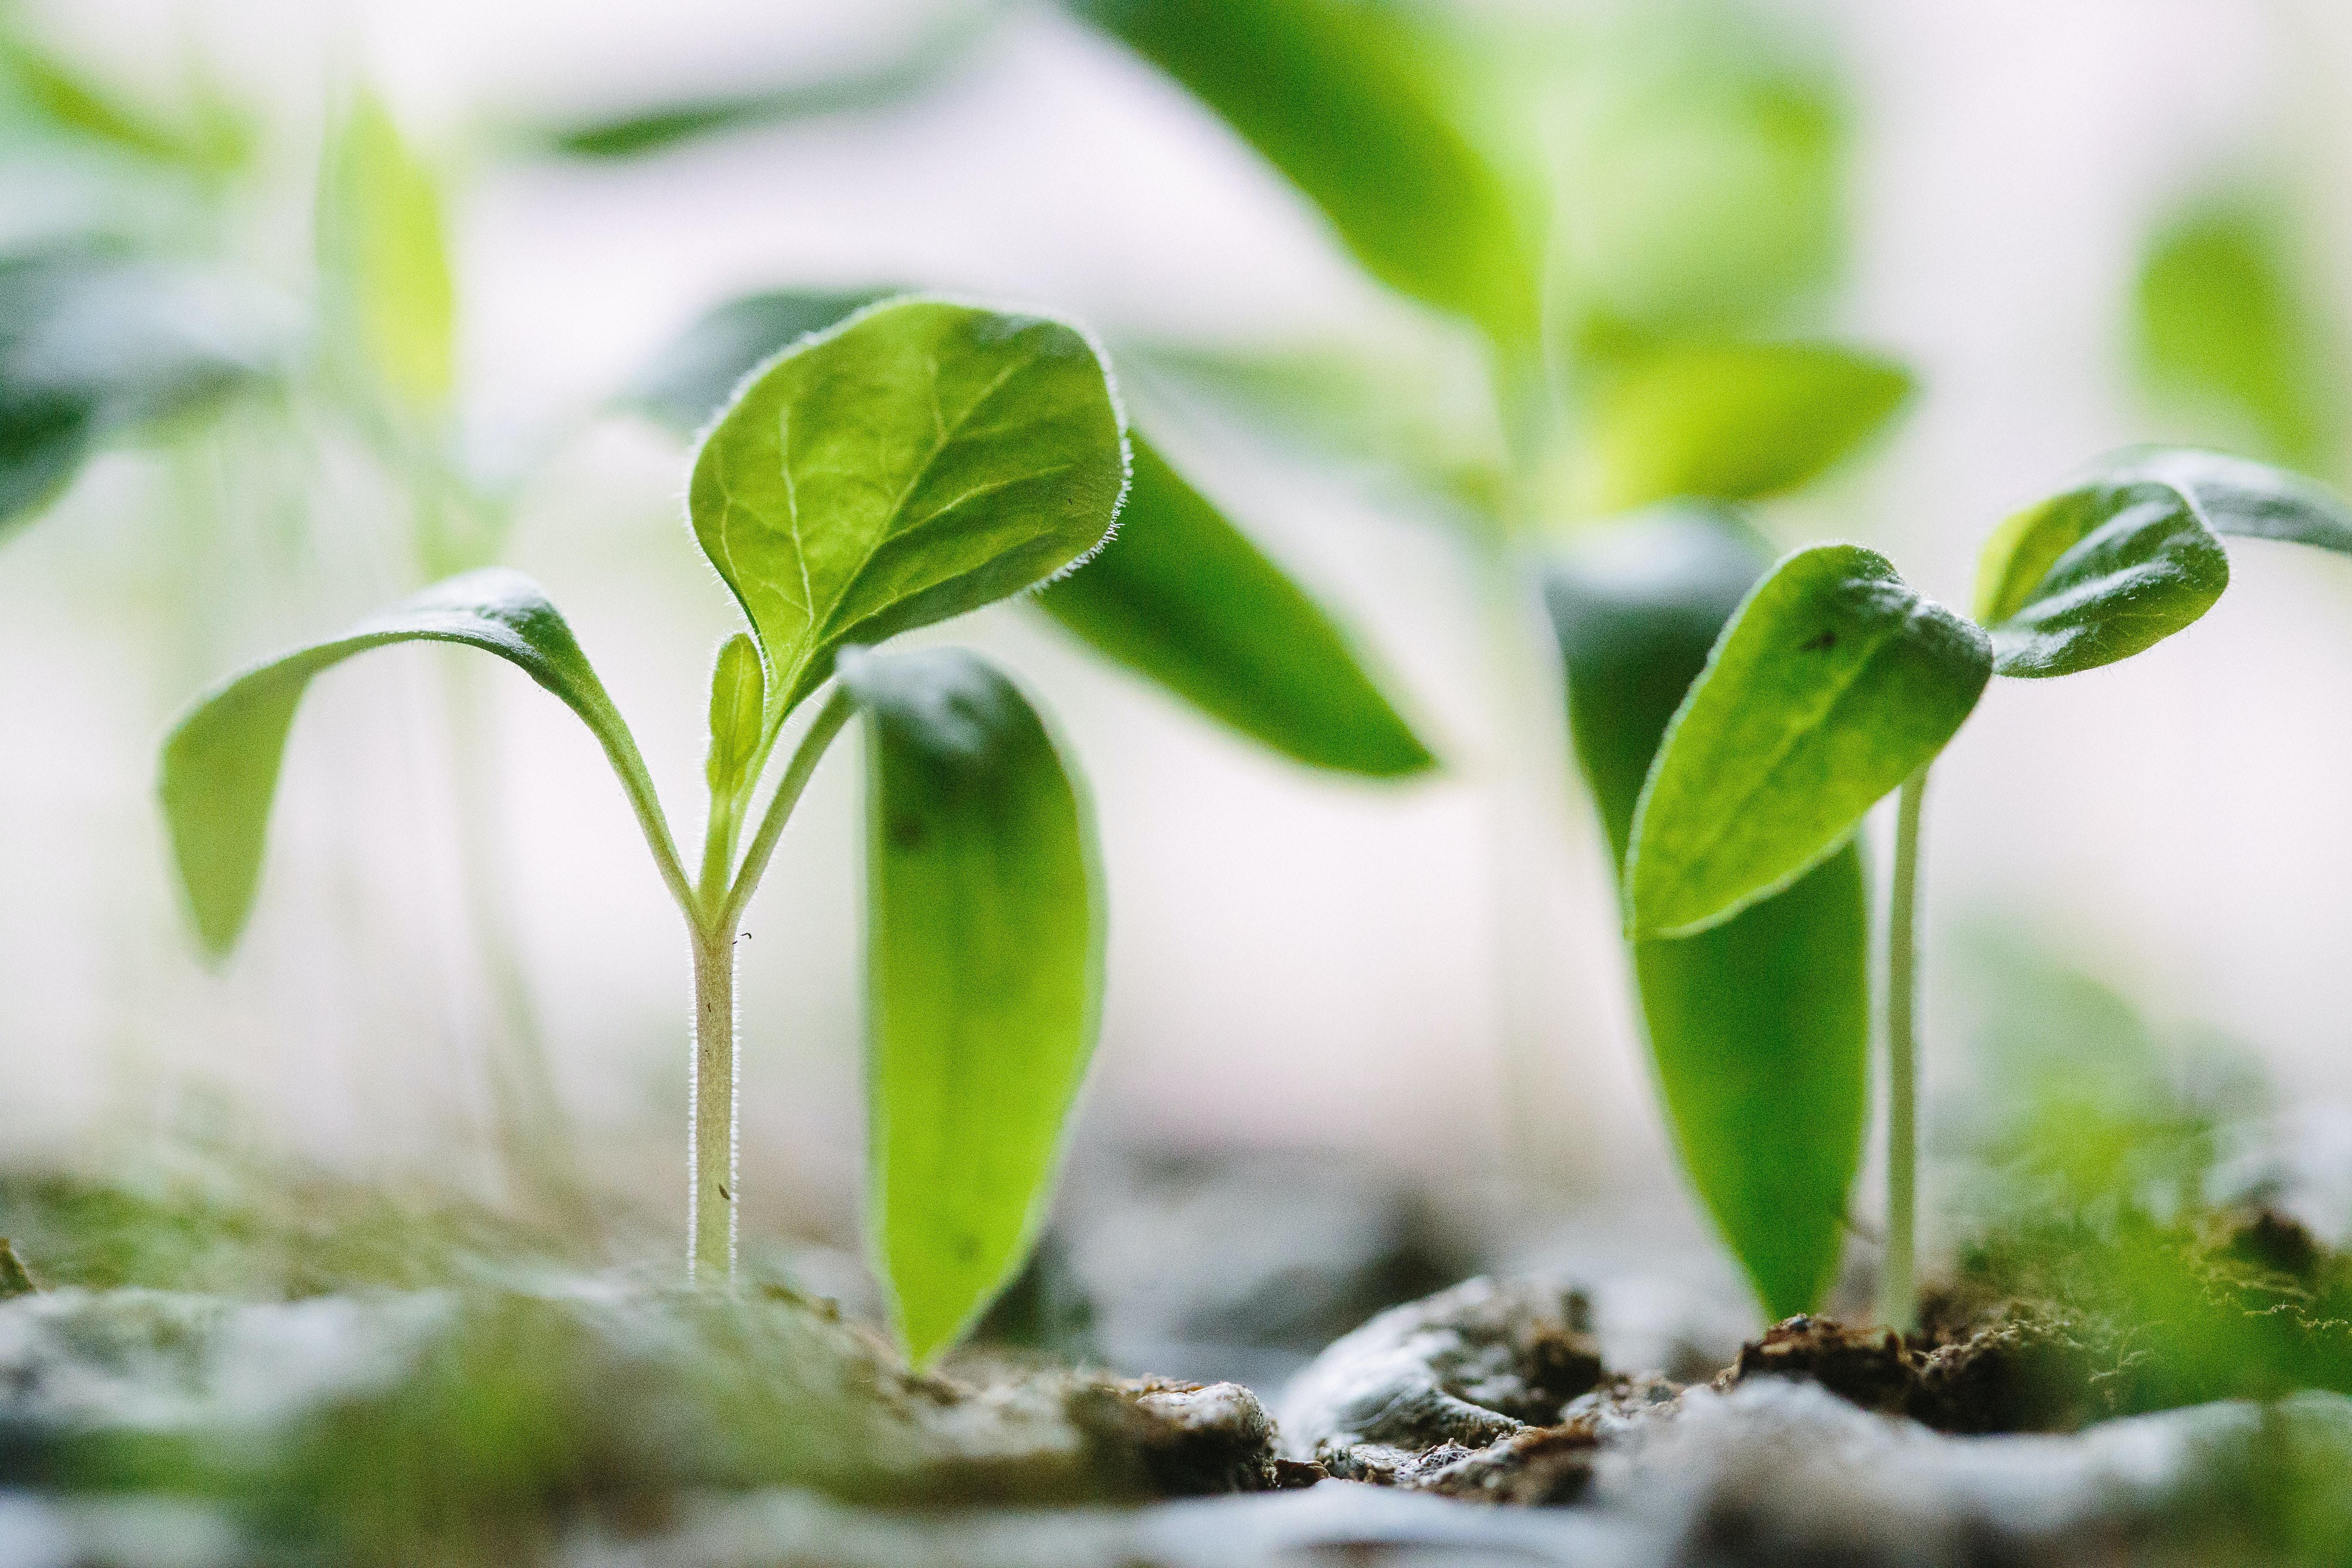 Capital efficient growth for SaaS